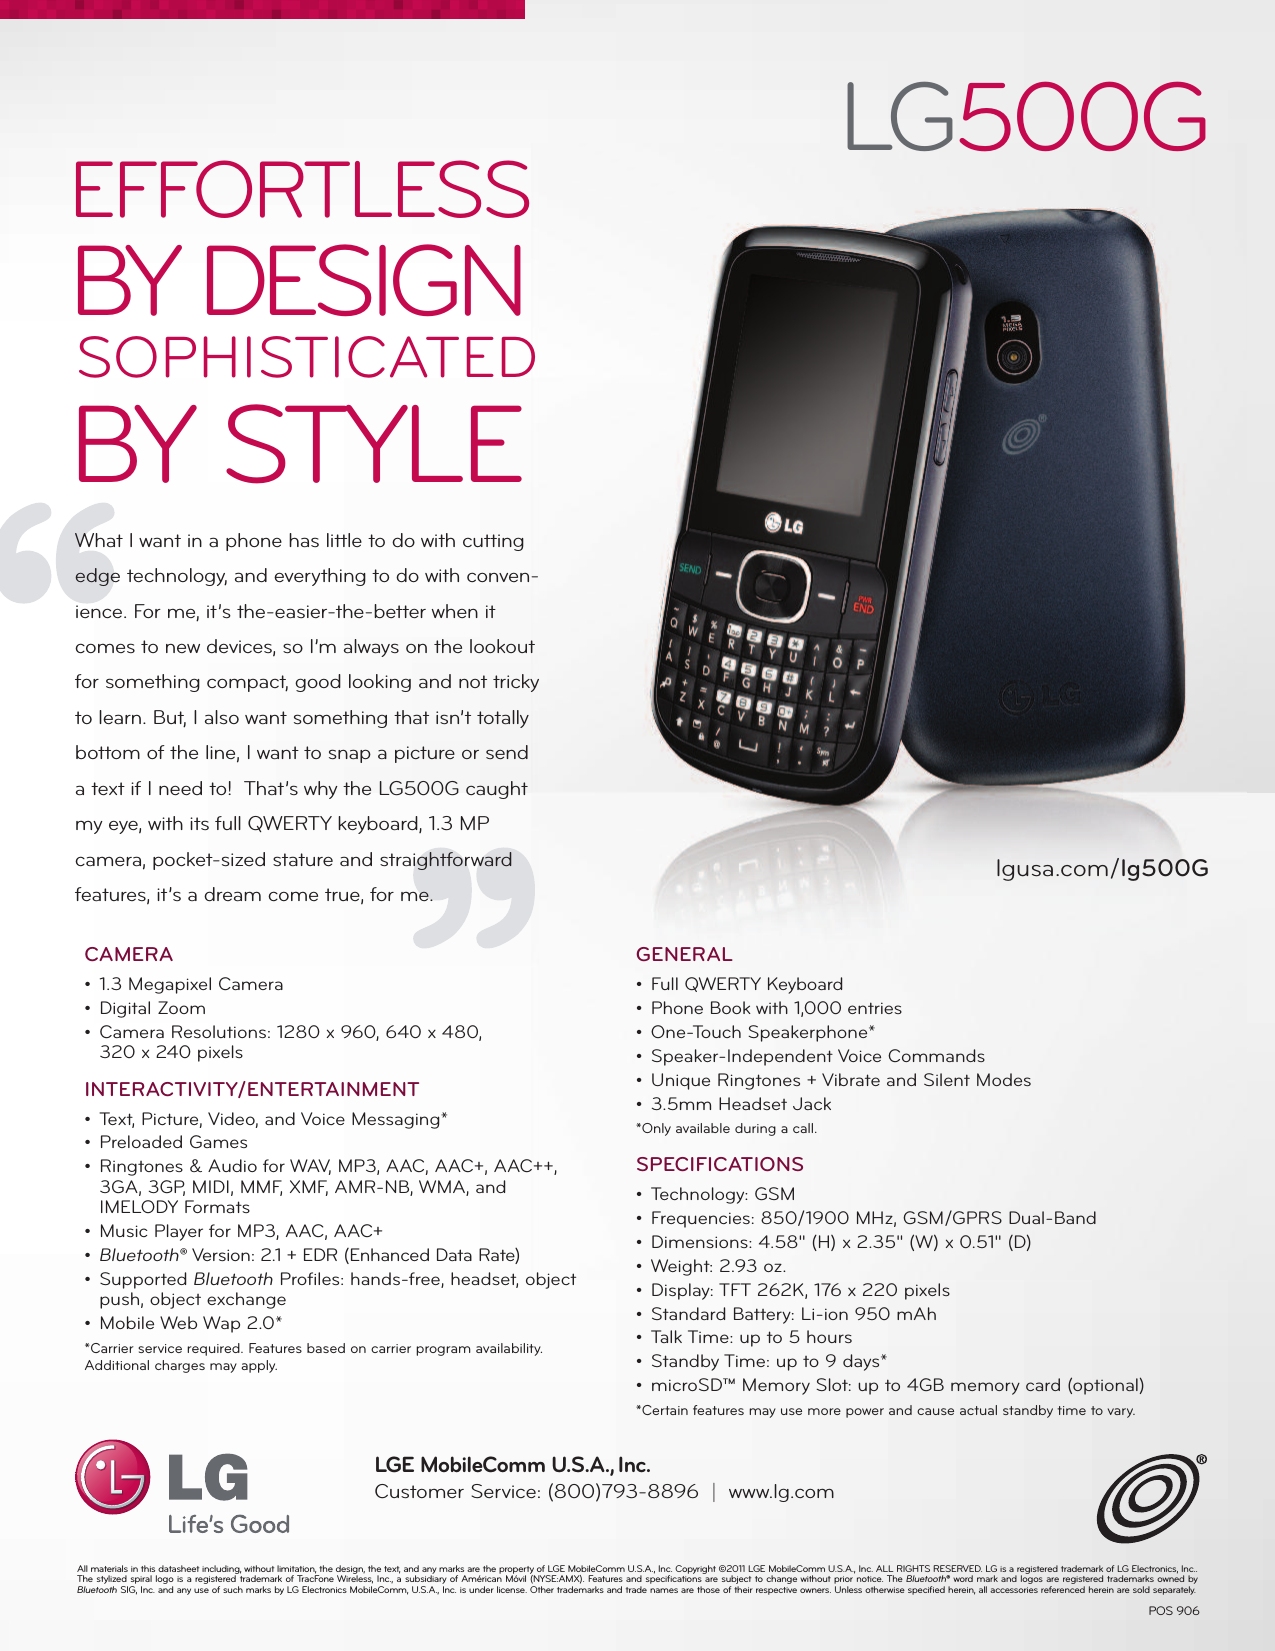 lg lg500g datasheet ax310 lg user manual data sheet datasheet rh usermanual wiki LG Cell Phone Operating Manual AT&T LG User Guide